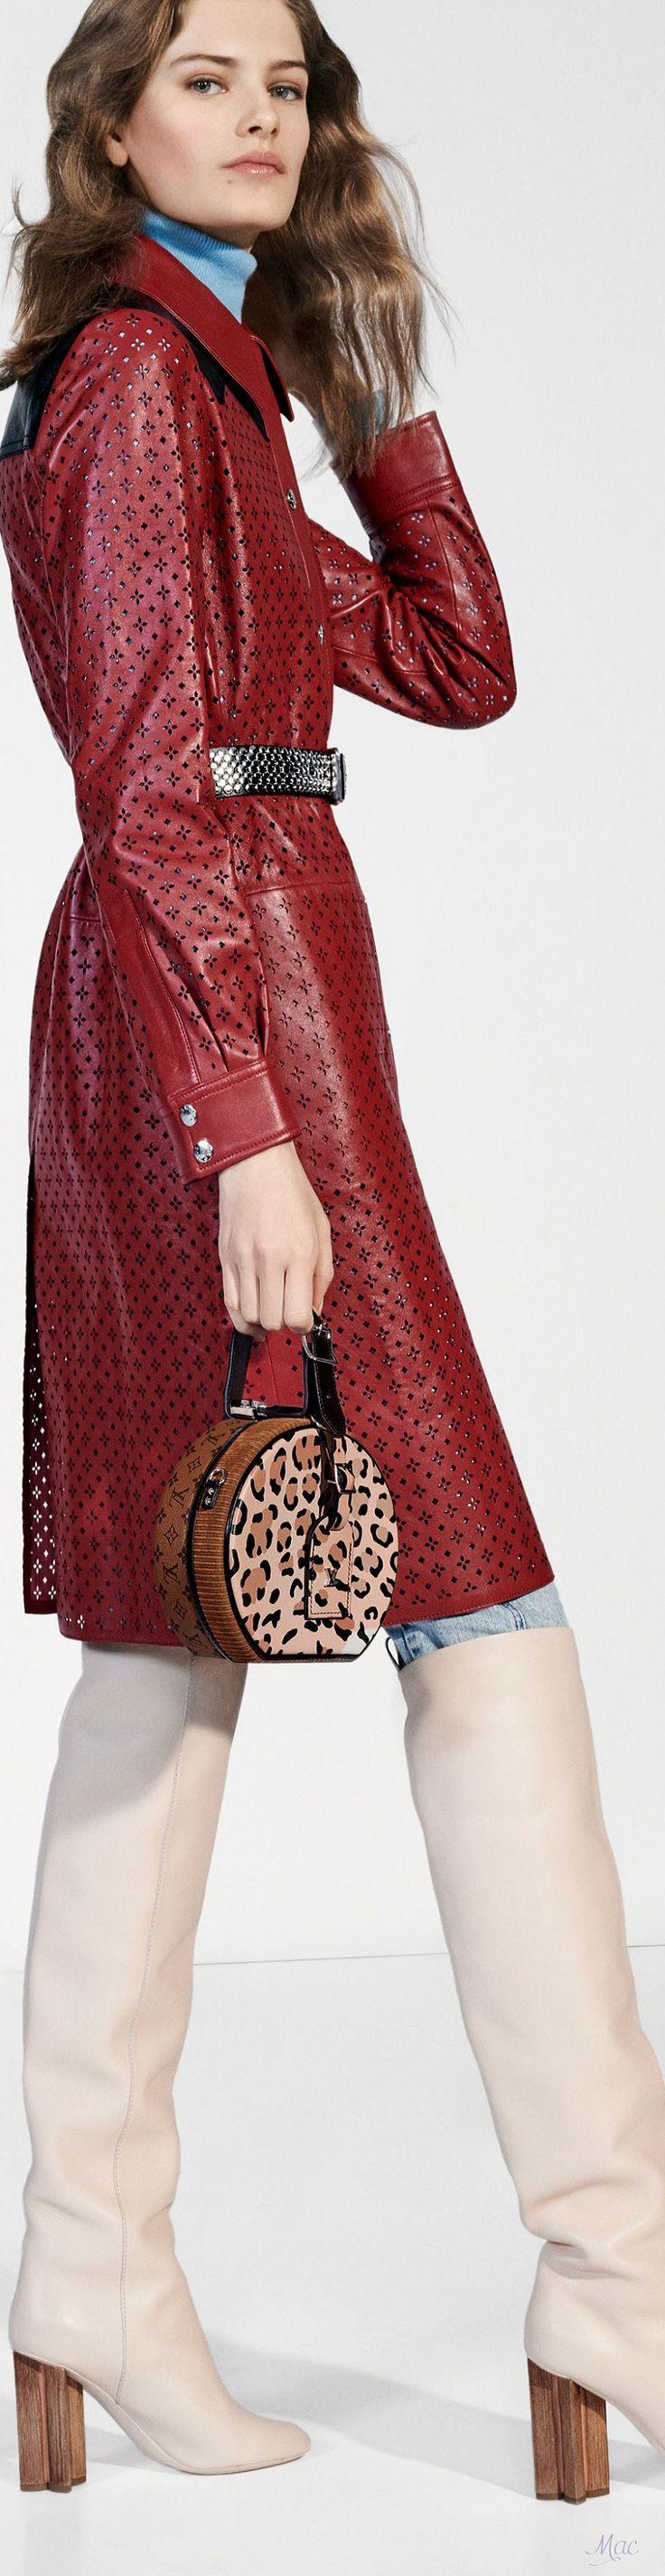 Pre-Fall 2018 Louis Vuitton